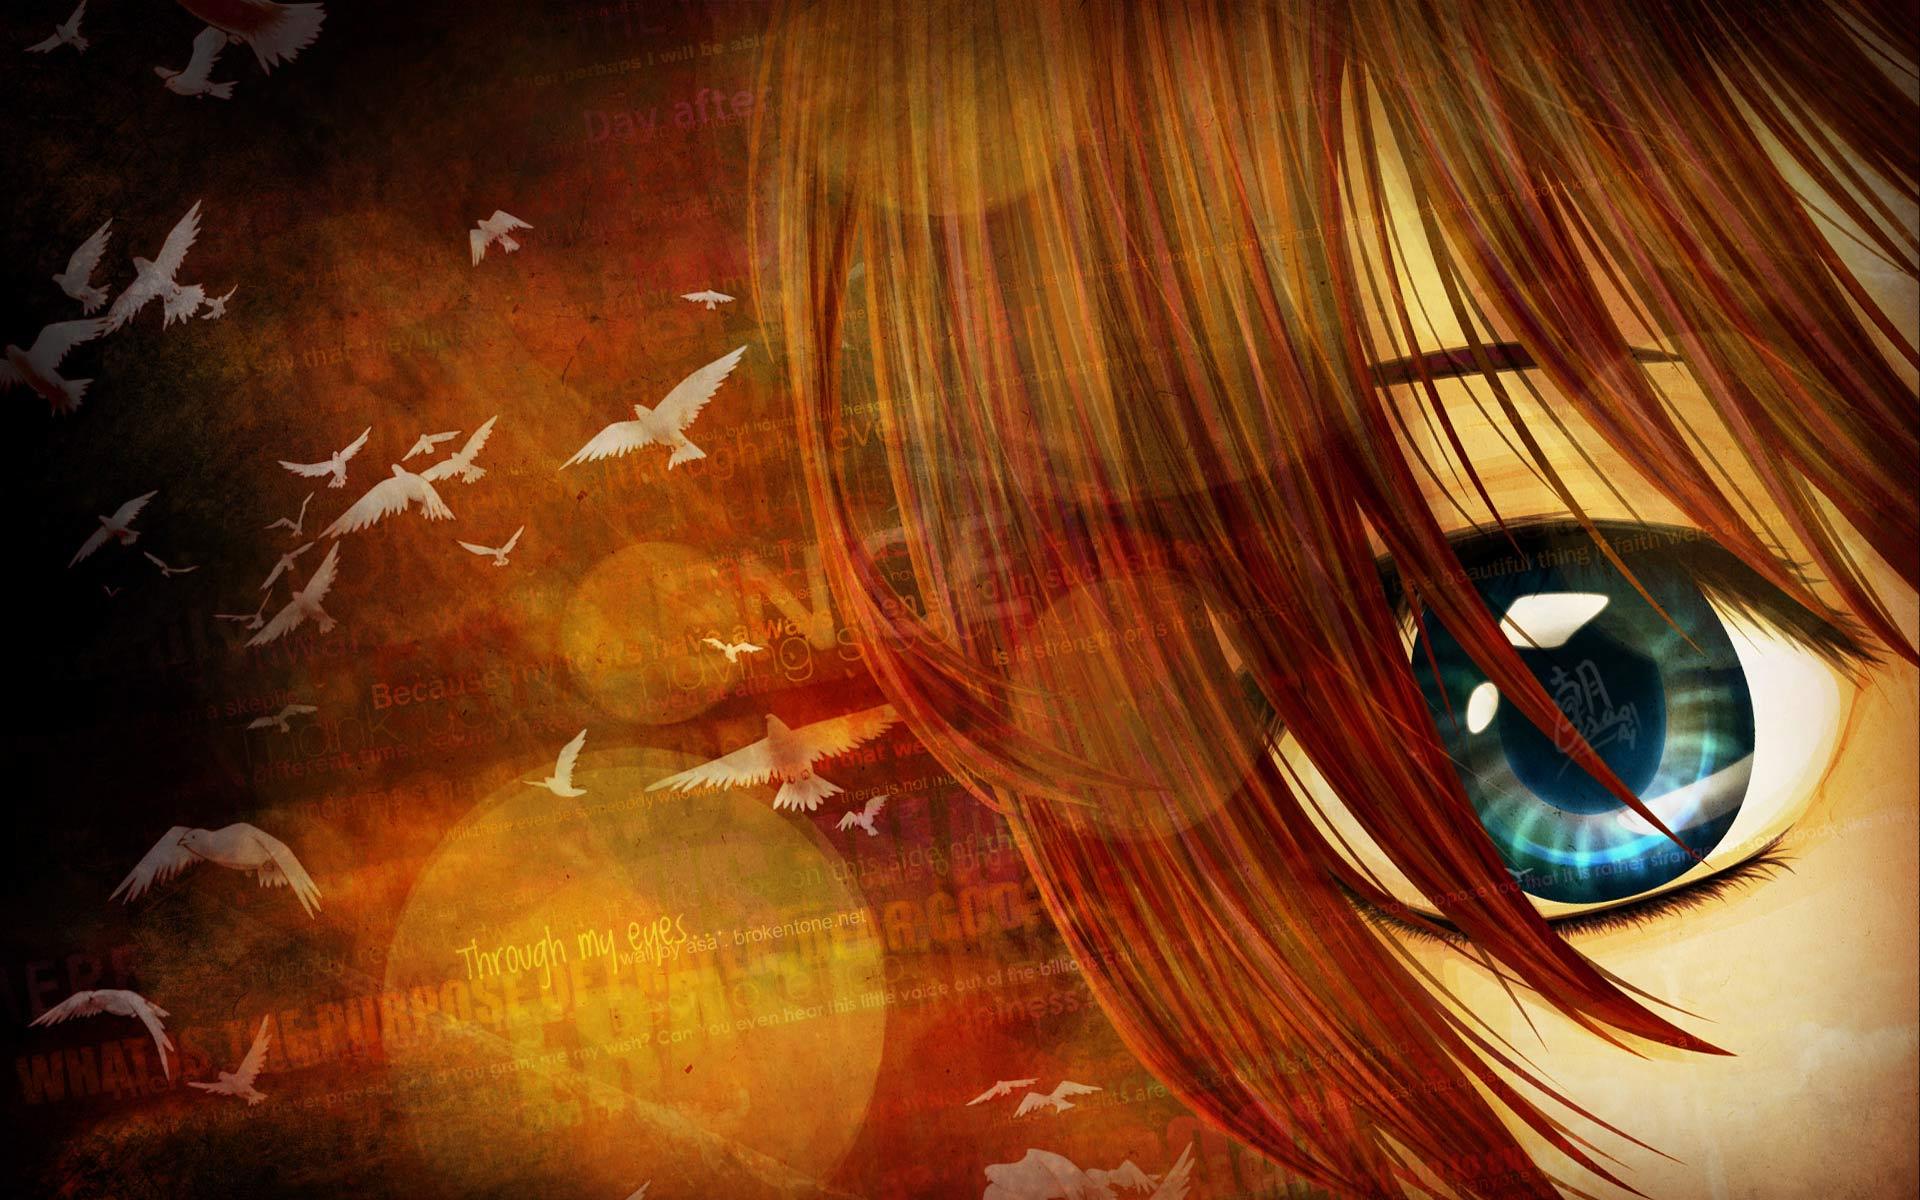 Best Anime Wallpaper   pic 2   PhotosJunction 1920x1200